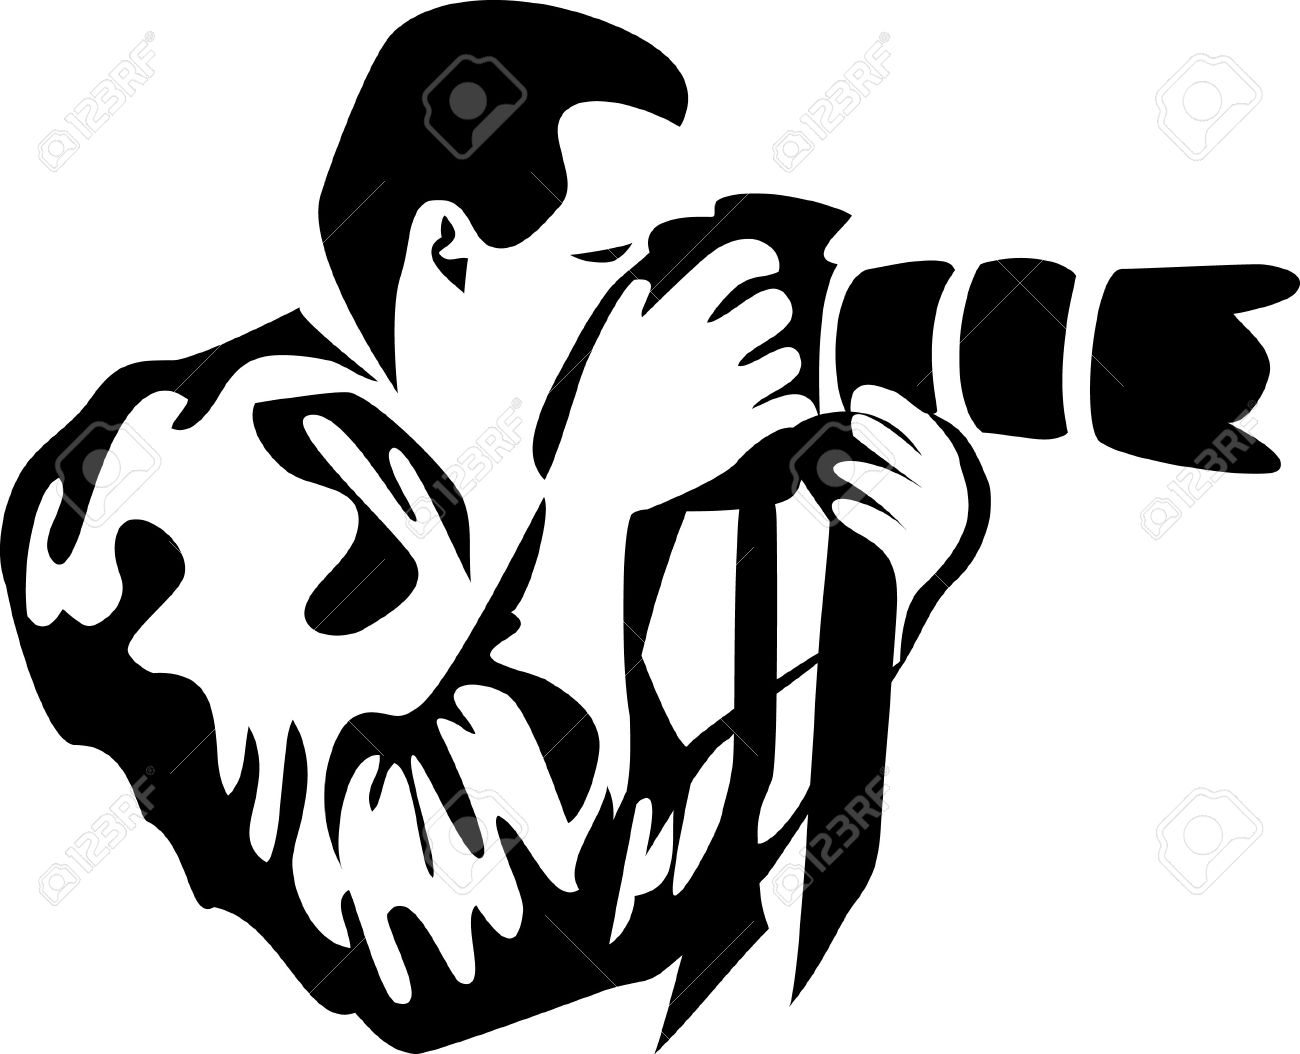 Camera clipart for logo svg 1300x1054 Logo Free Paparazzi Camera Clipart - 1054*1300 - Free ... svg